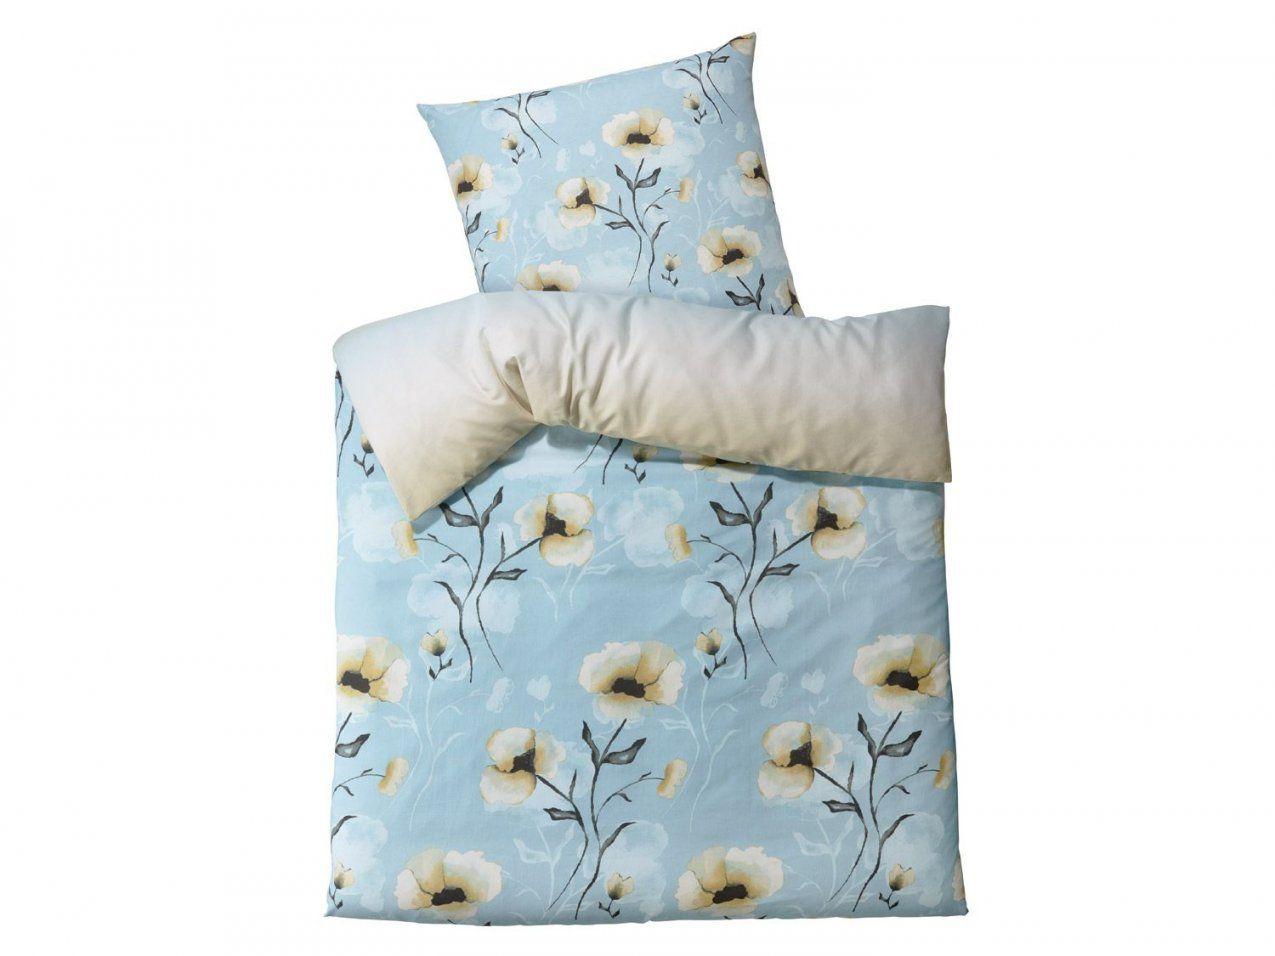 meradiso renforc bettw sche 135 x 200 cm lidl deutschland lidl von flamingo bettw sche lidl. Black Bedroom Furniture Sets. Home Design Ideas